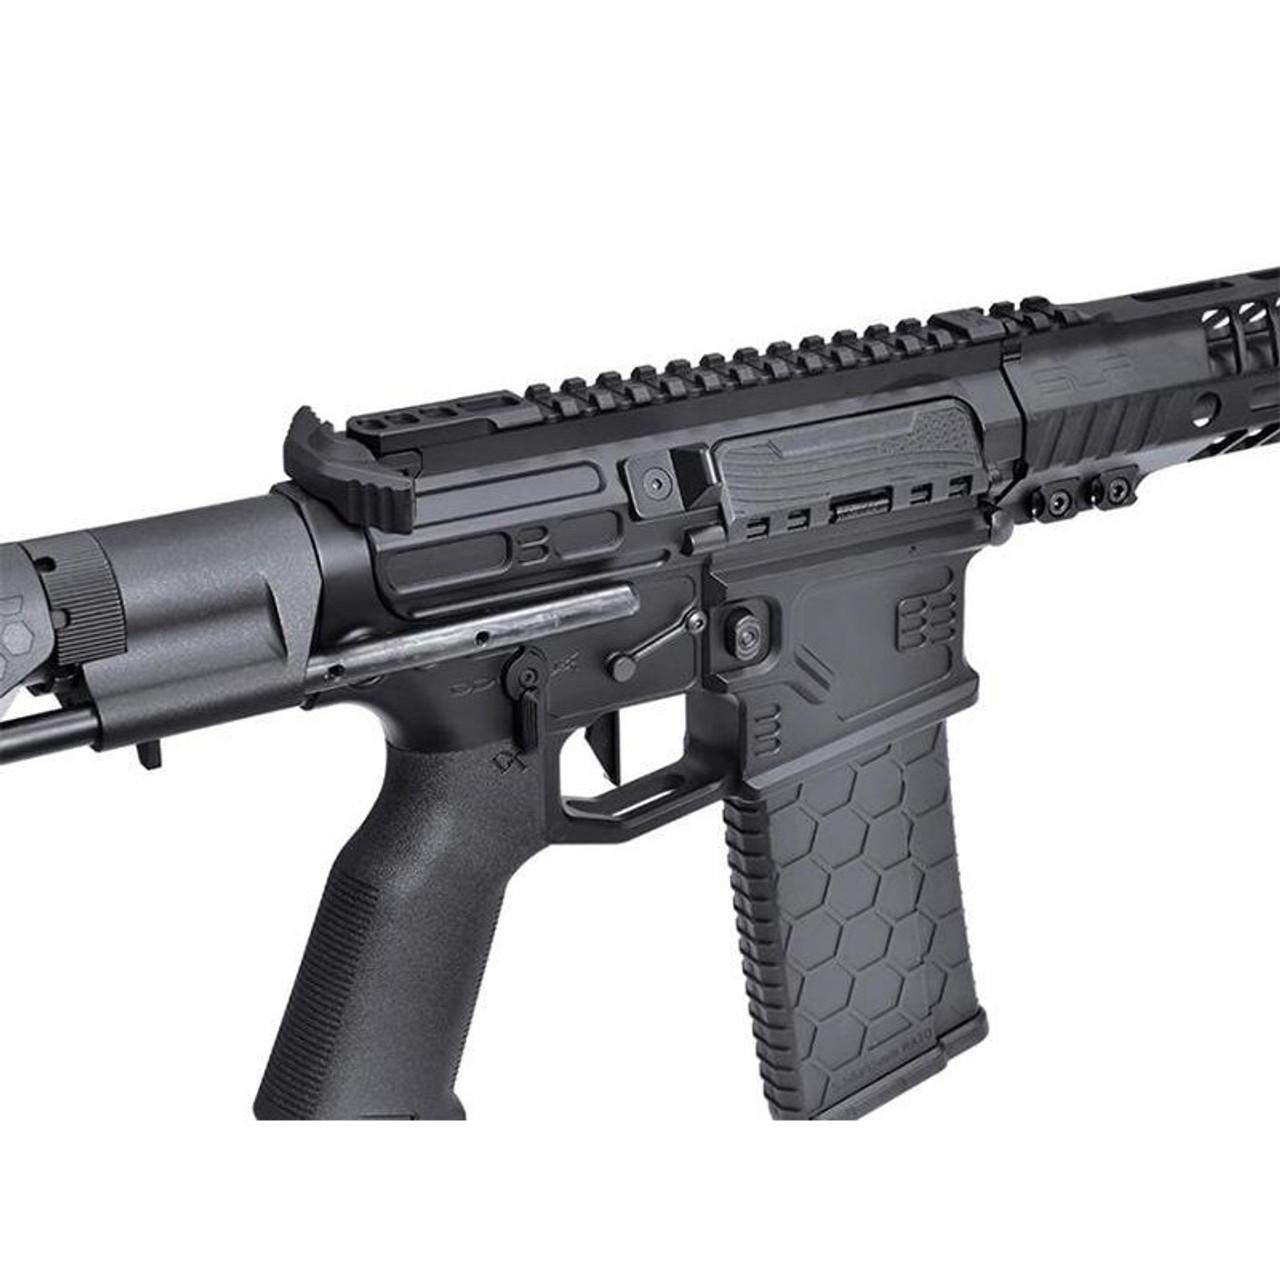 Dytac SLR B15 Helix M4 AEG Rifle